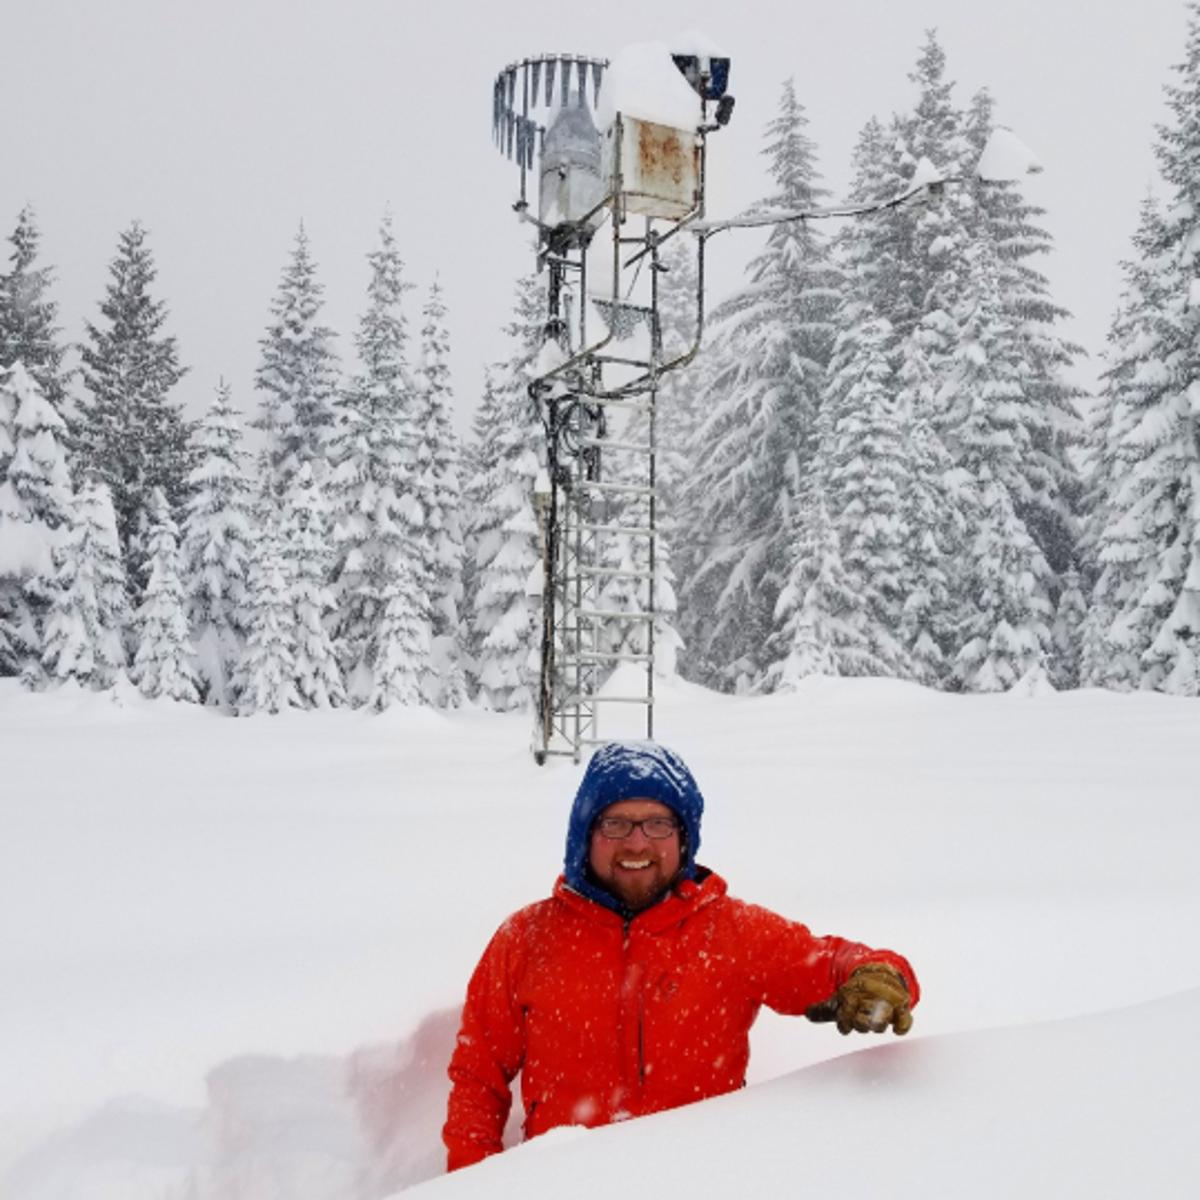 Sunnyside Wa Weather >> Snowfall Reports From Around Yakima Area Winter Weather